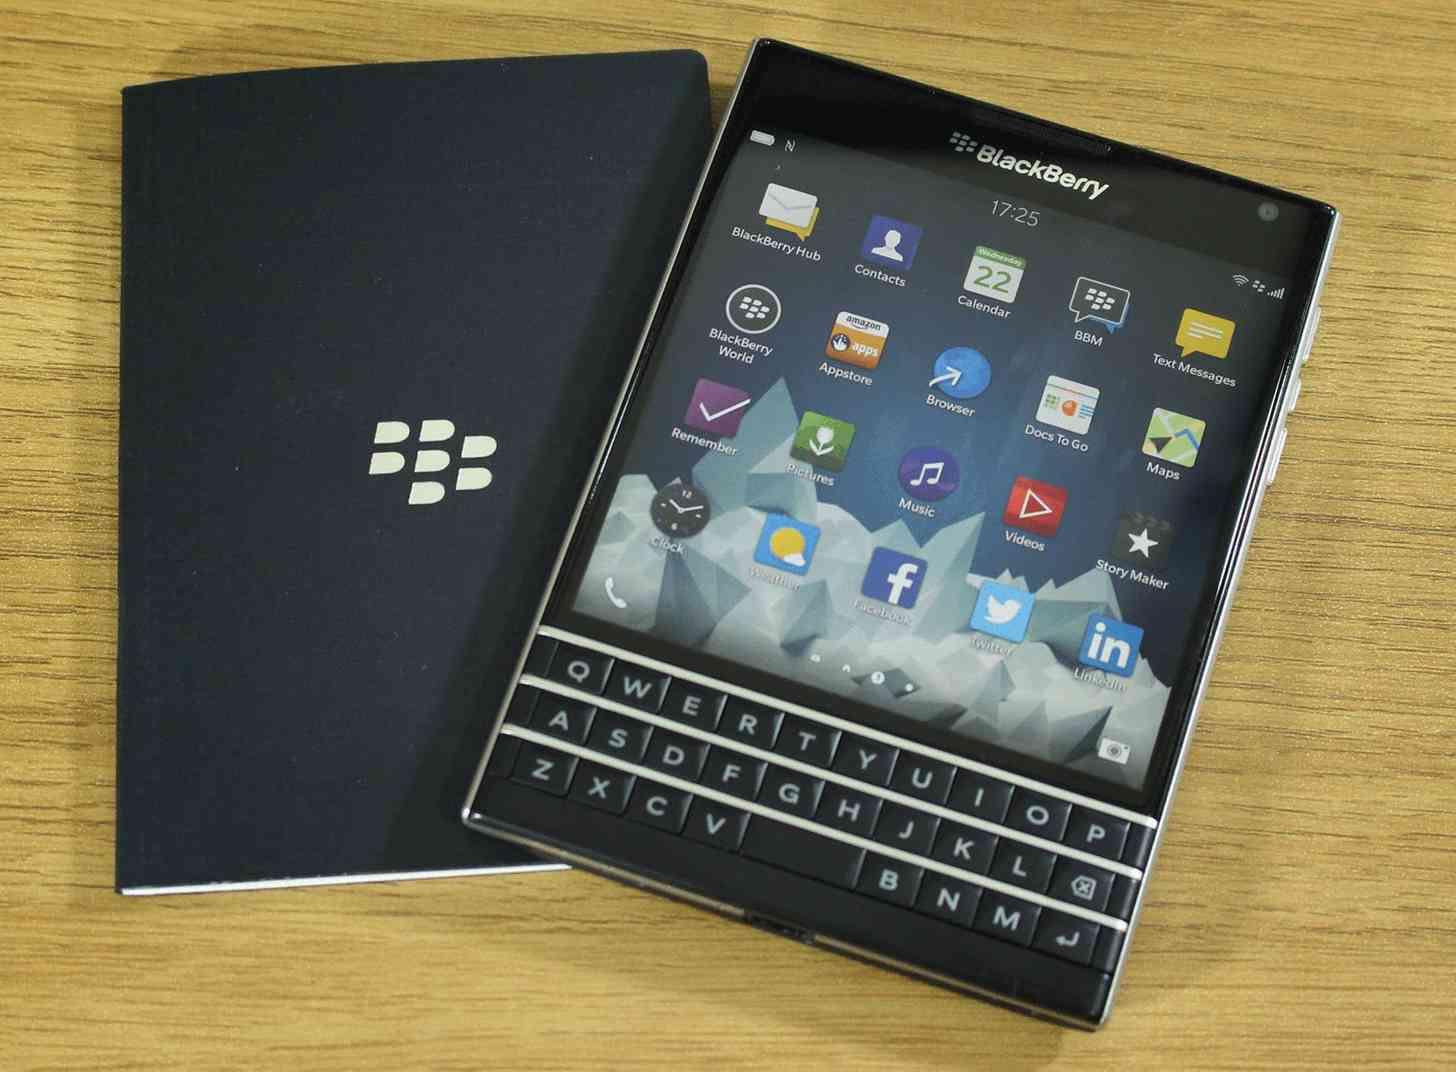 BlackBerry Passport large